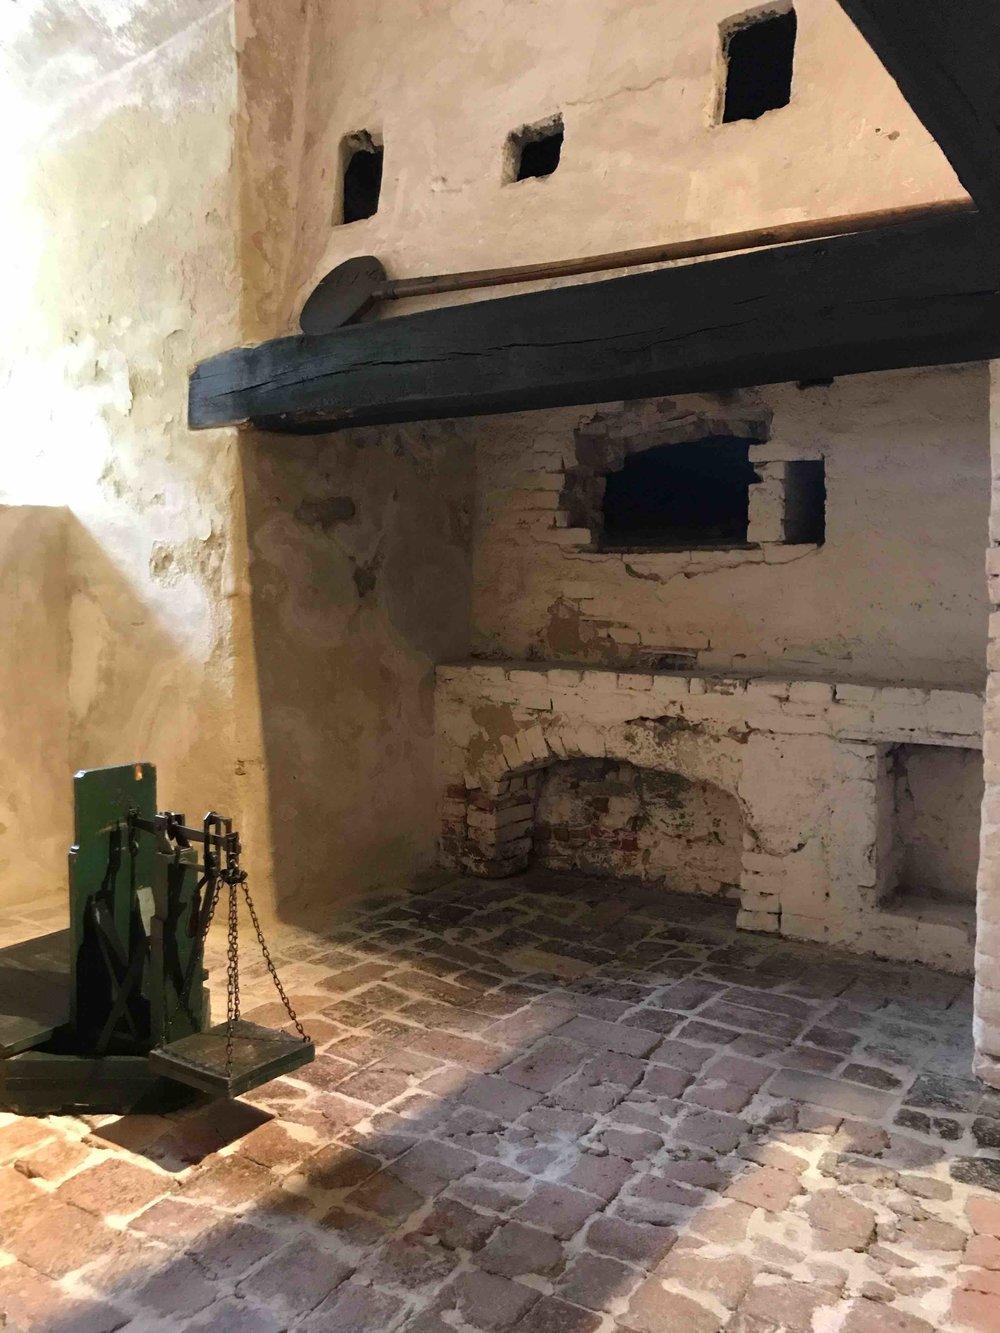 #SchlossForchtenstein #esterhazy #kamin #brot.jpg